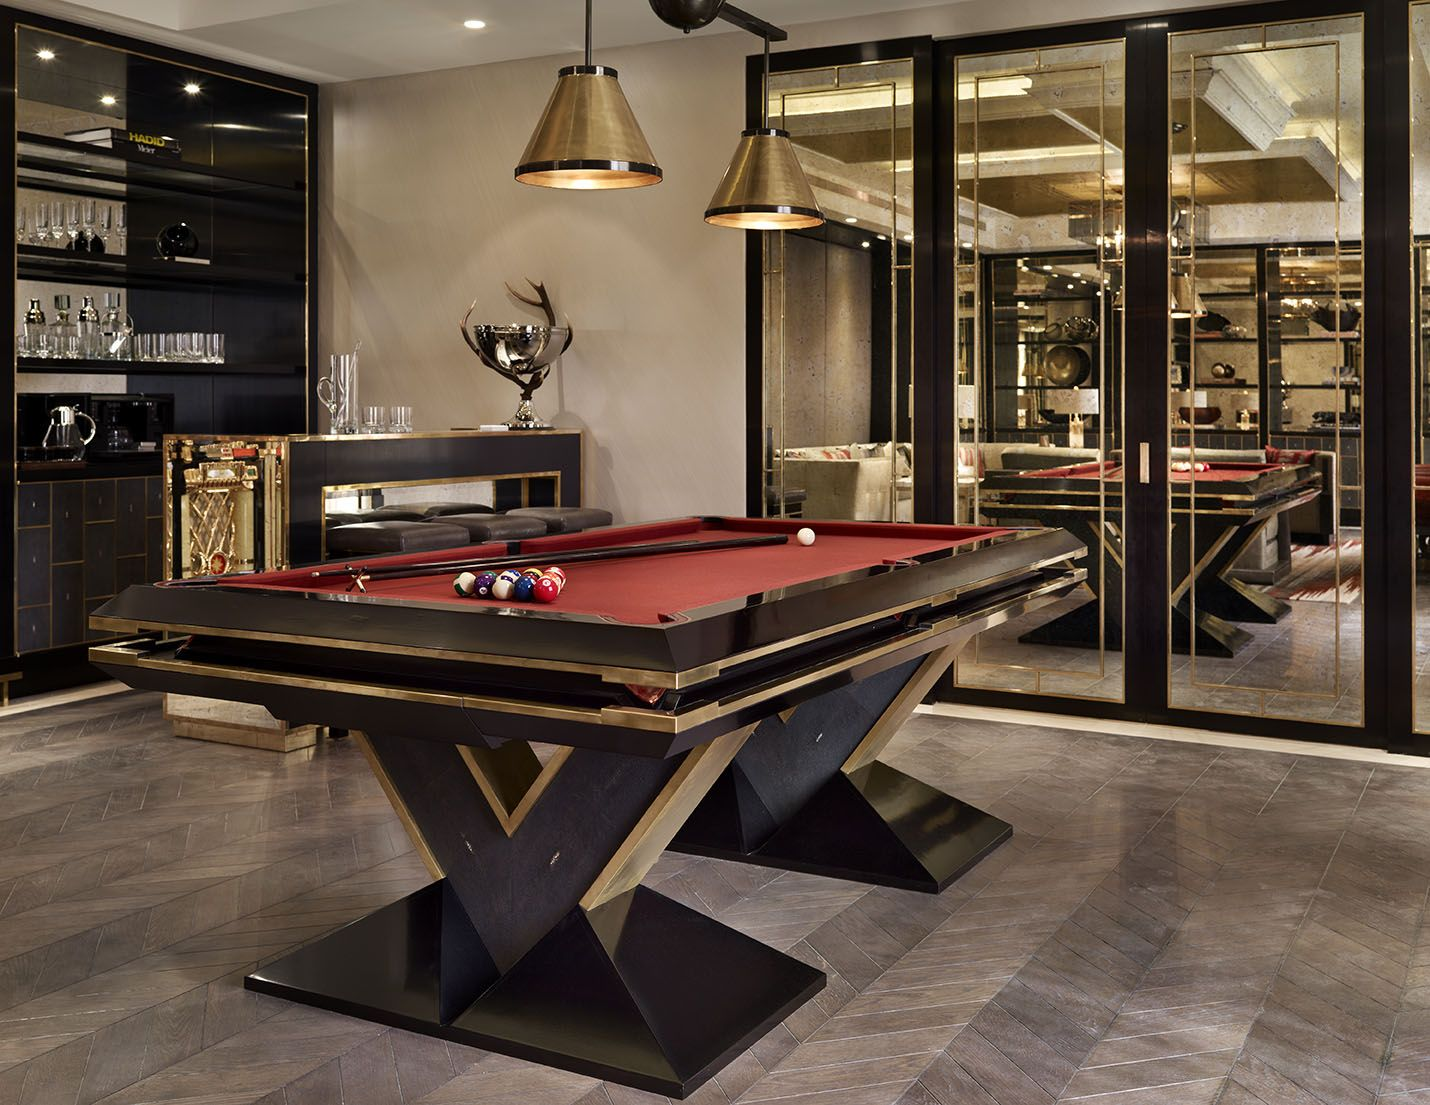 Pin by 黄 小隆 on 设计感觉 | Custom pool tables, Pool table room ...